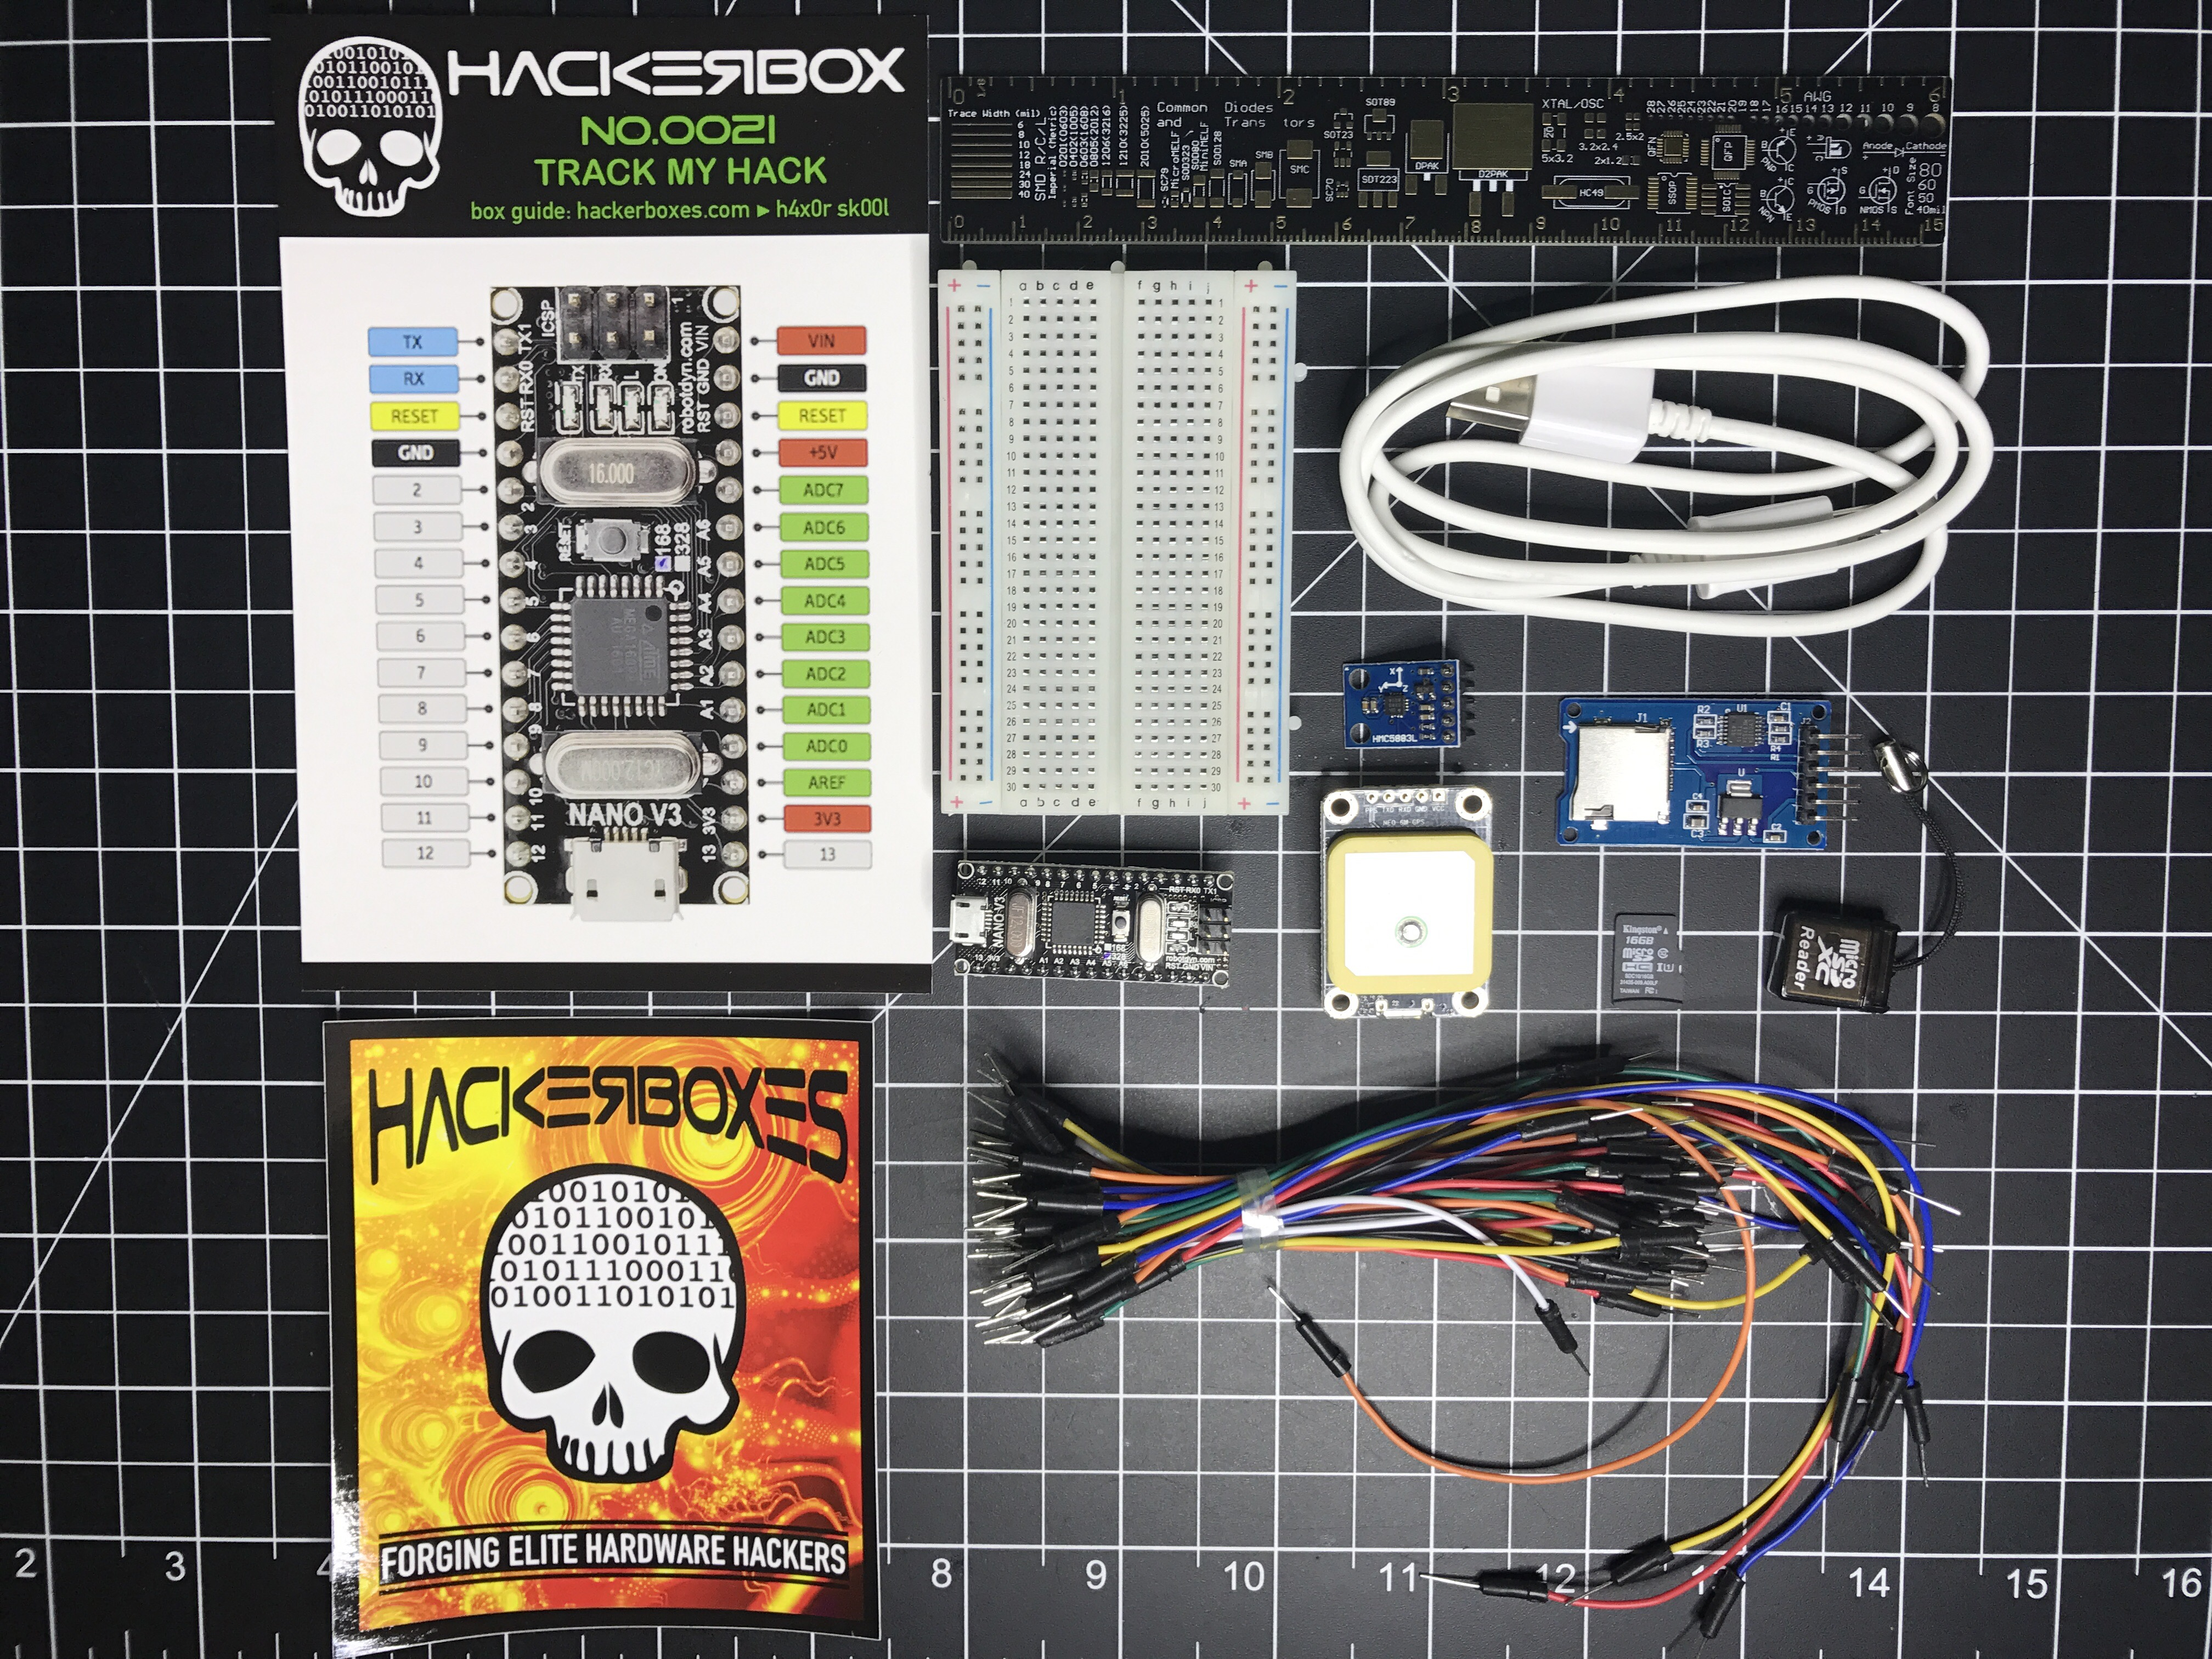 hackerbox-0021.jpg